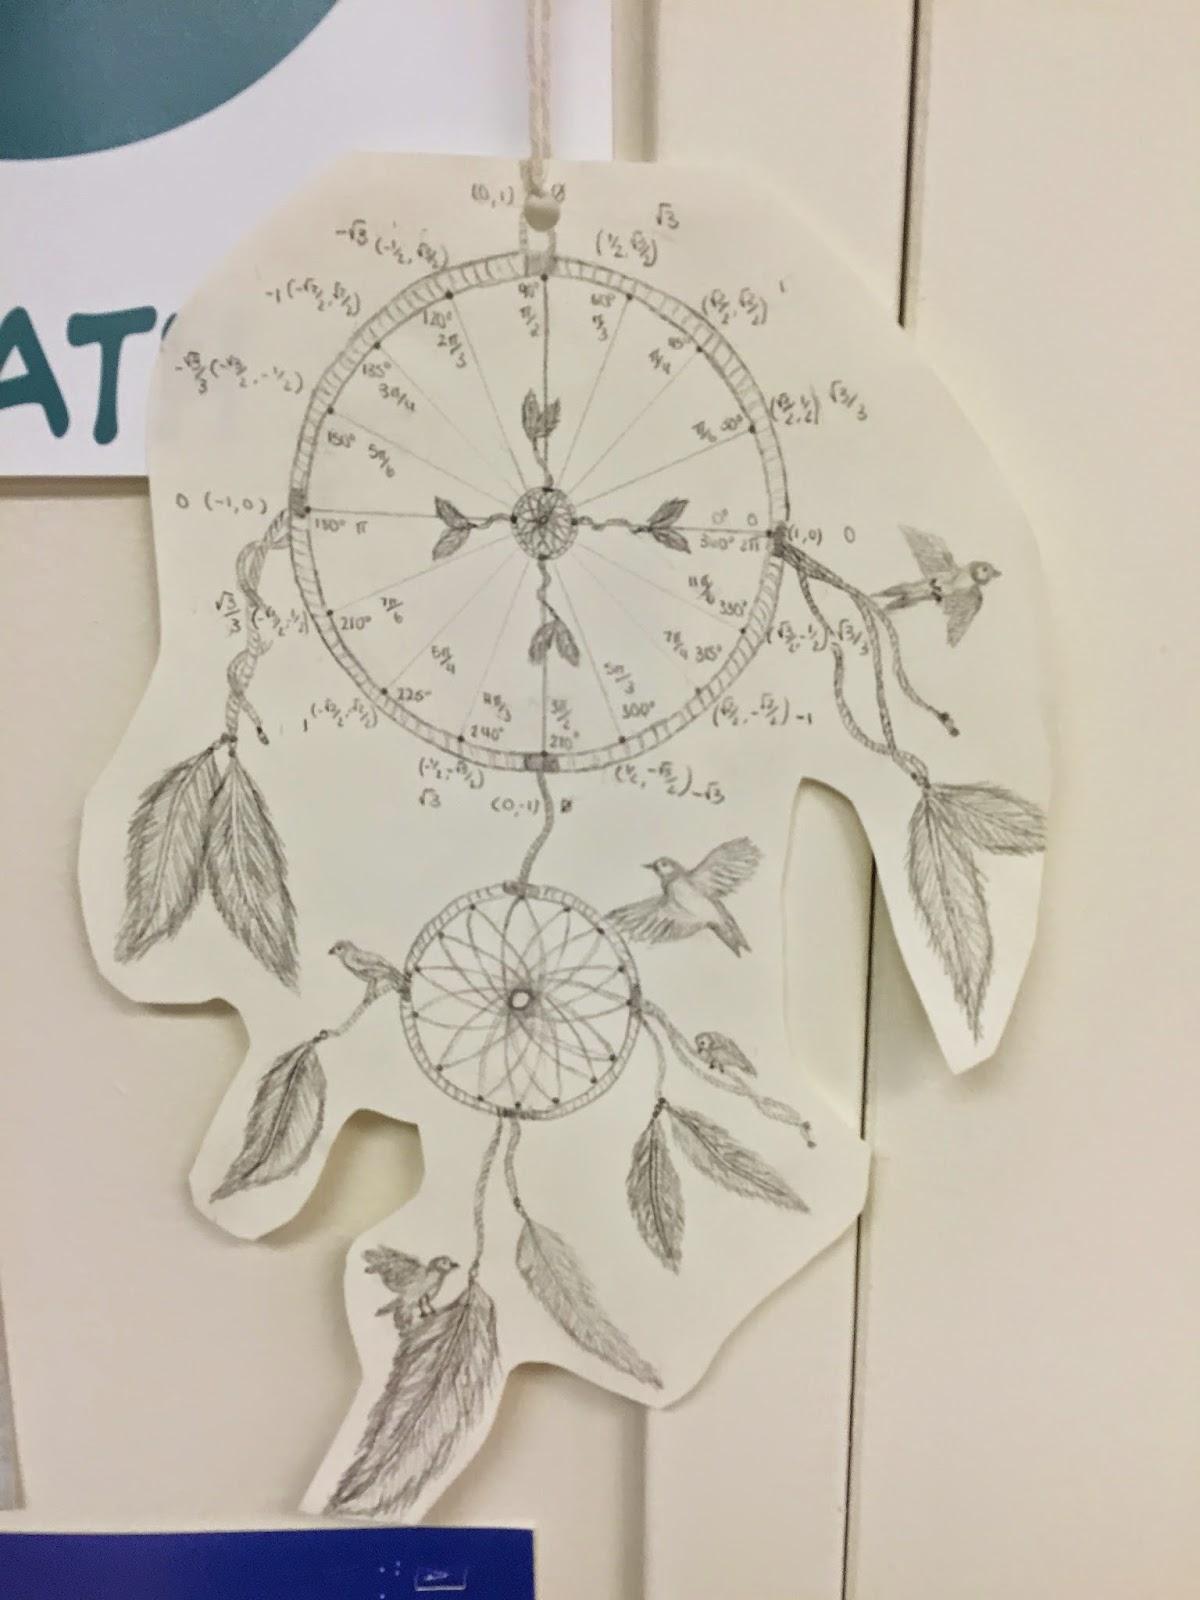 eat play math: the unit circle of life